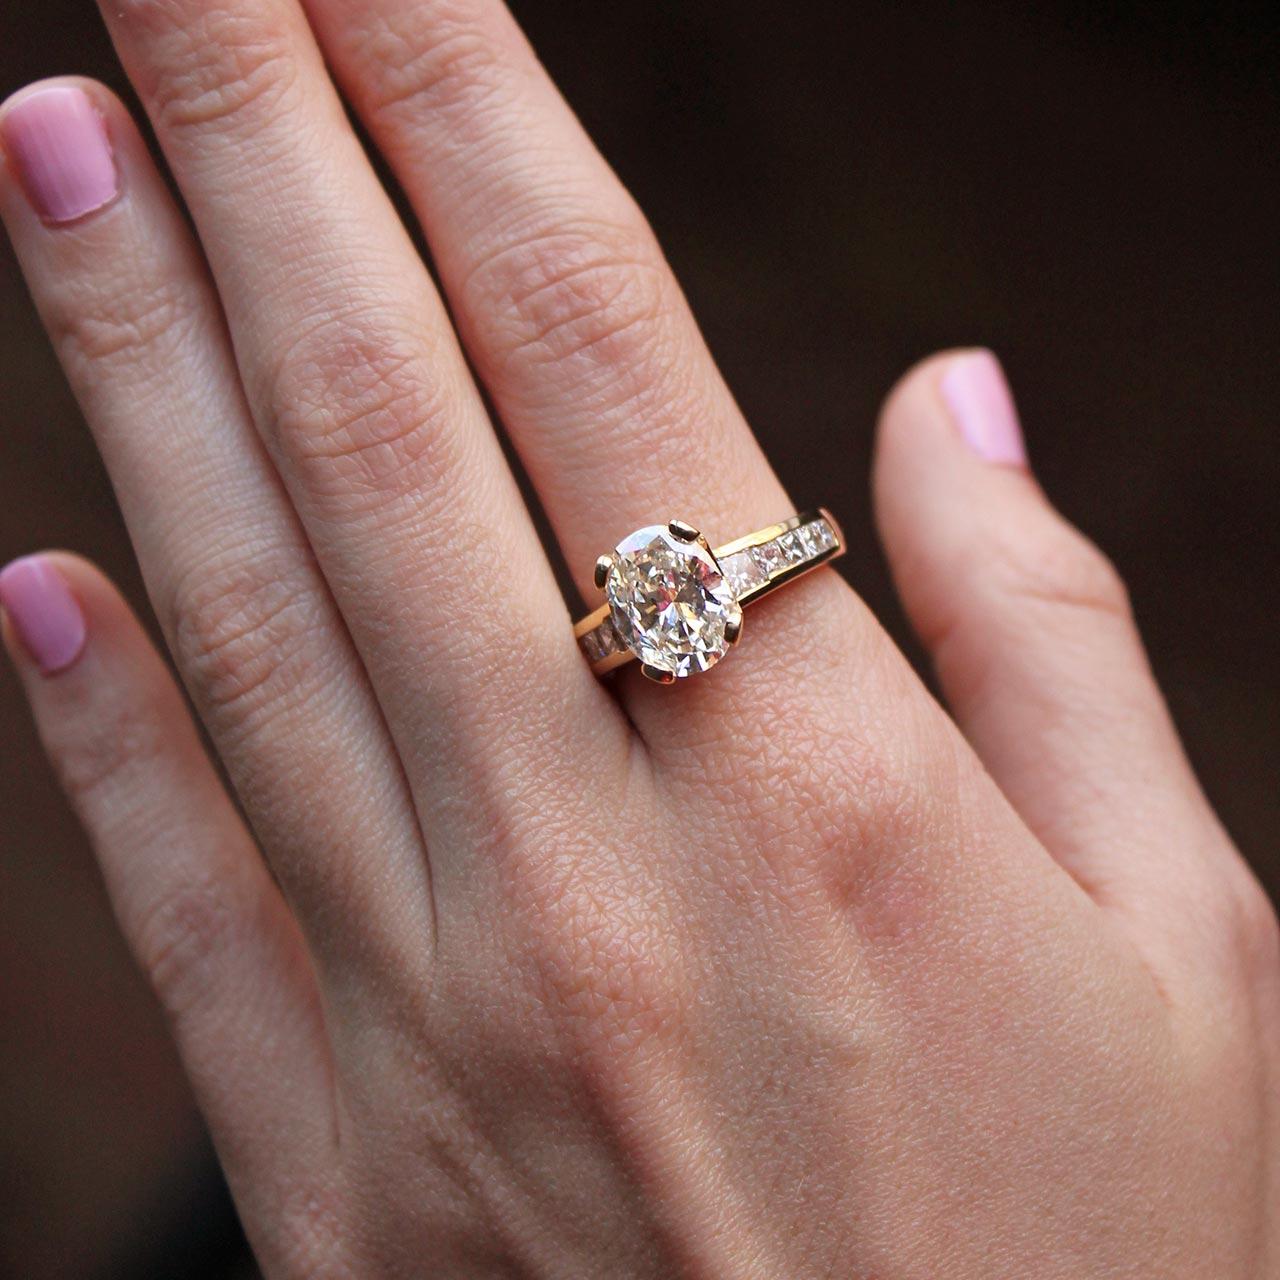 Import Diamonds   RC Trading Co - Diamond Importers & Wholesalers - PA